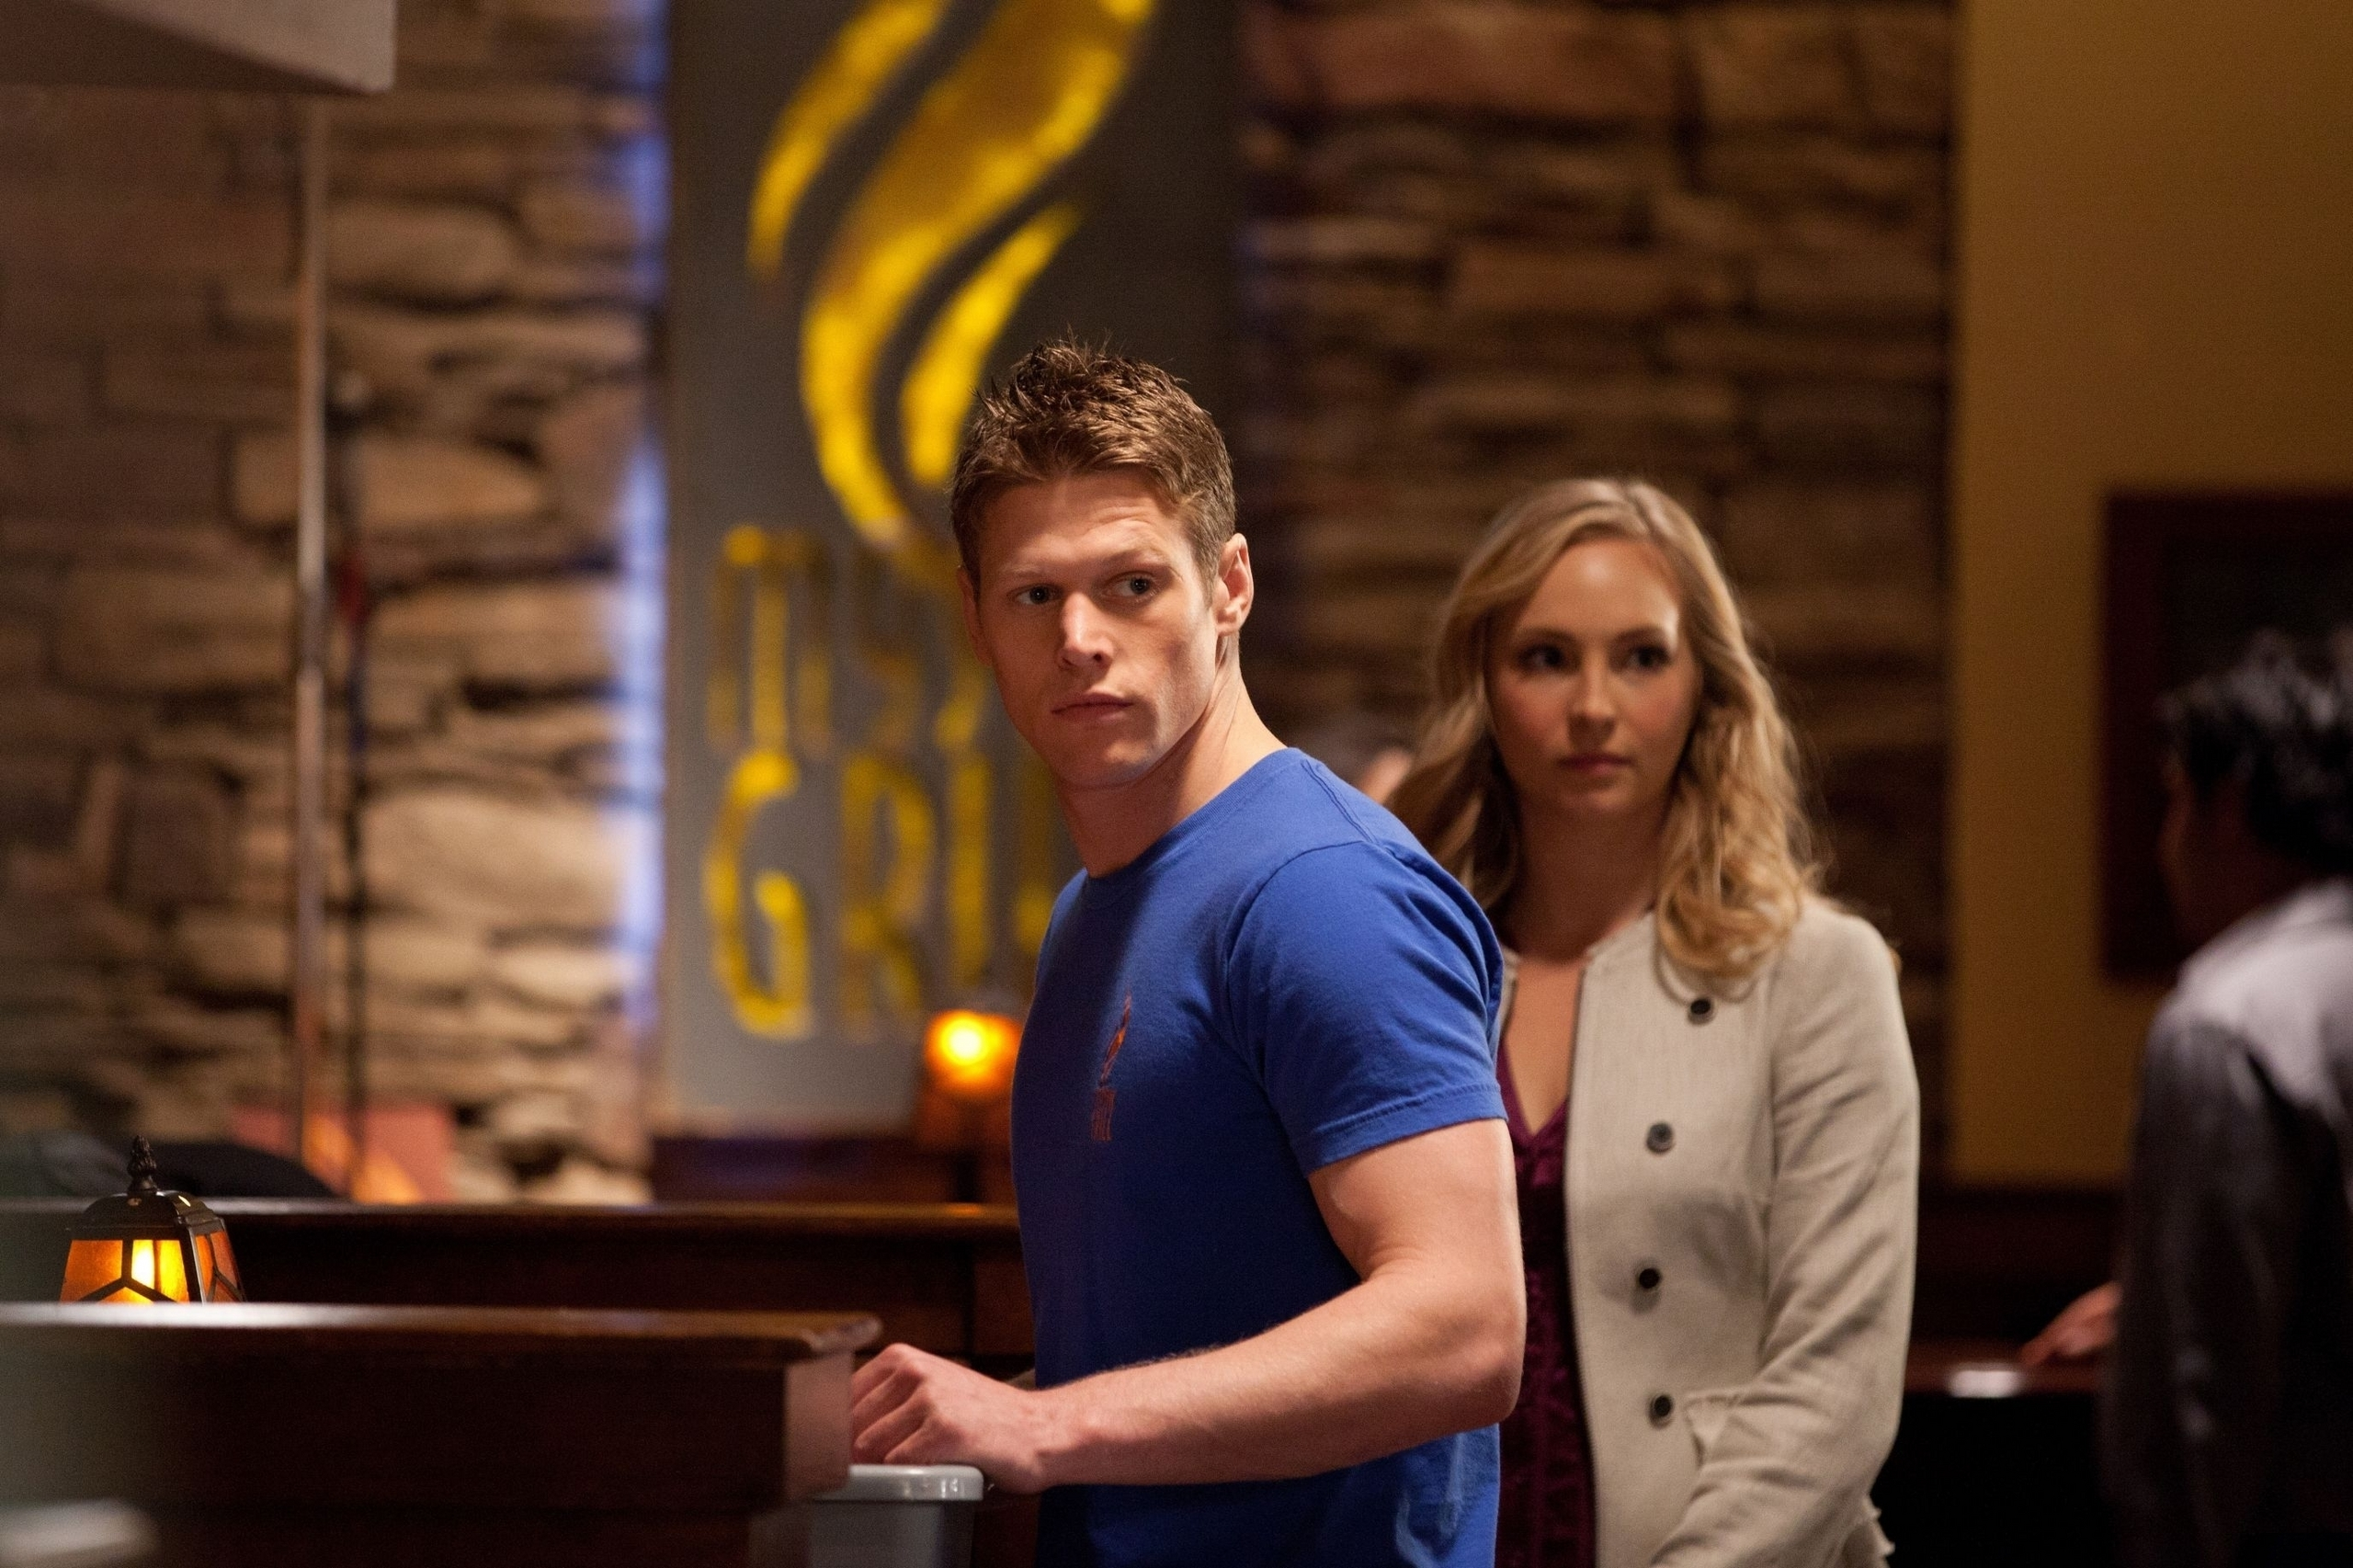 New still of Candice as Caroline in TVD 2x20: The Last день [HQ]!